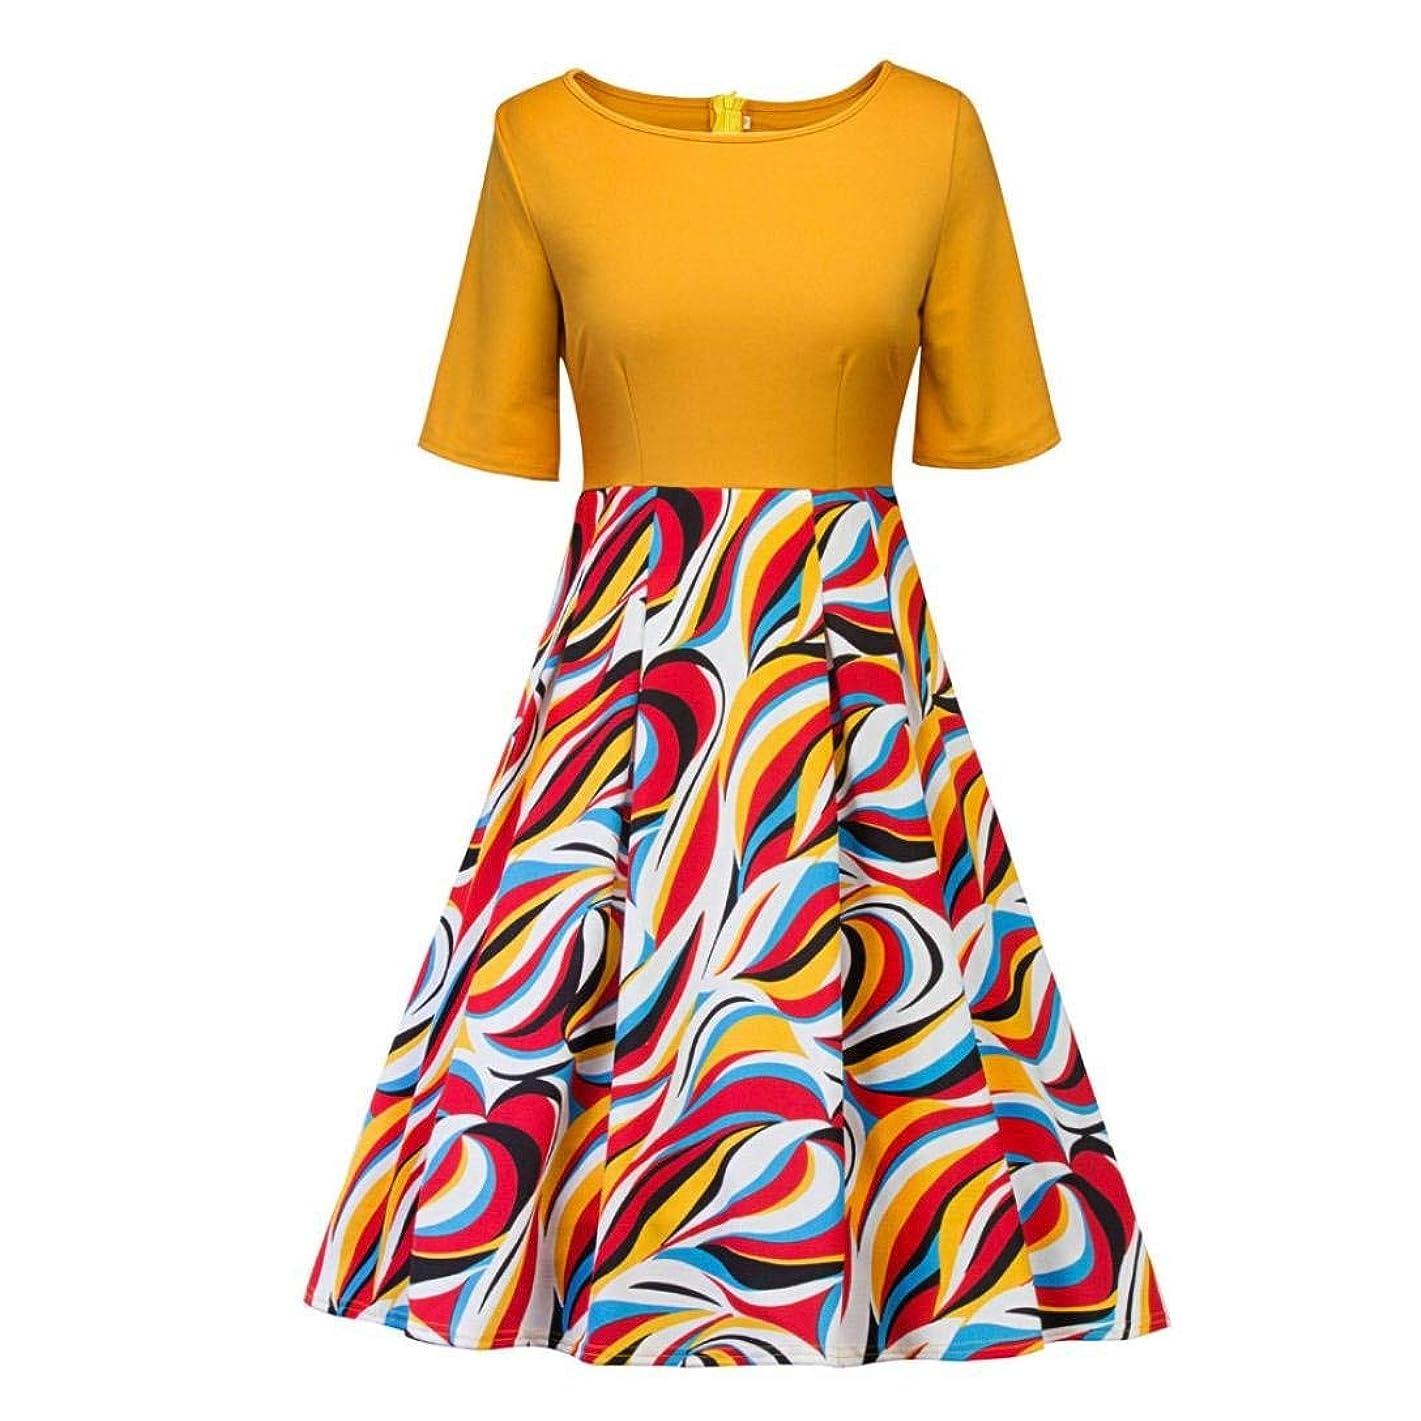 Women Vintage Dresses with Sleeves,Lelili Vintage Floral Printed Patchwork Half Sleeve Crewneck Swing A-Line Dress